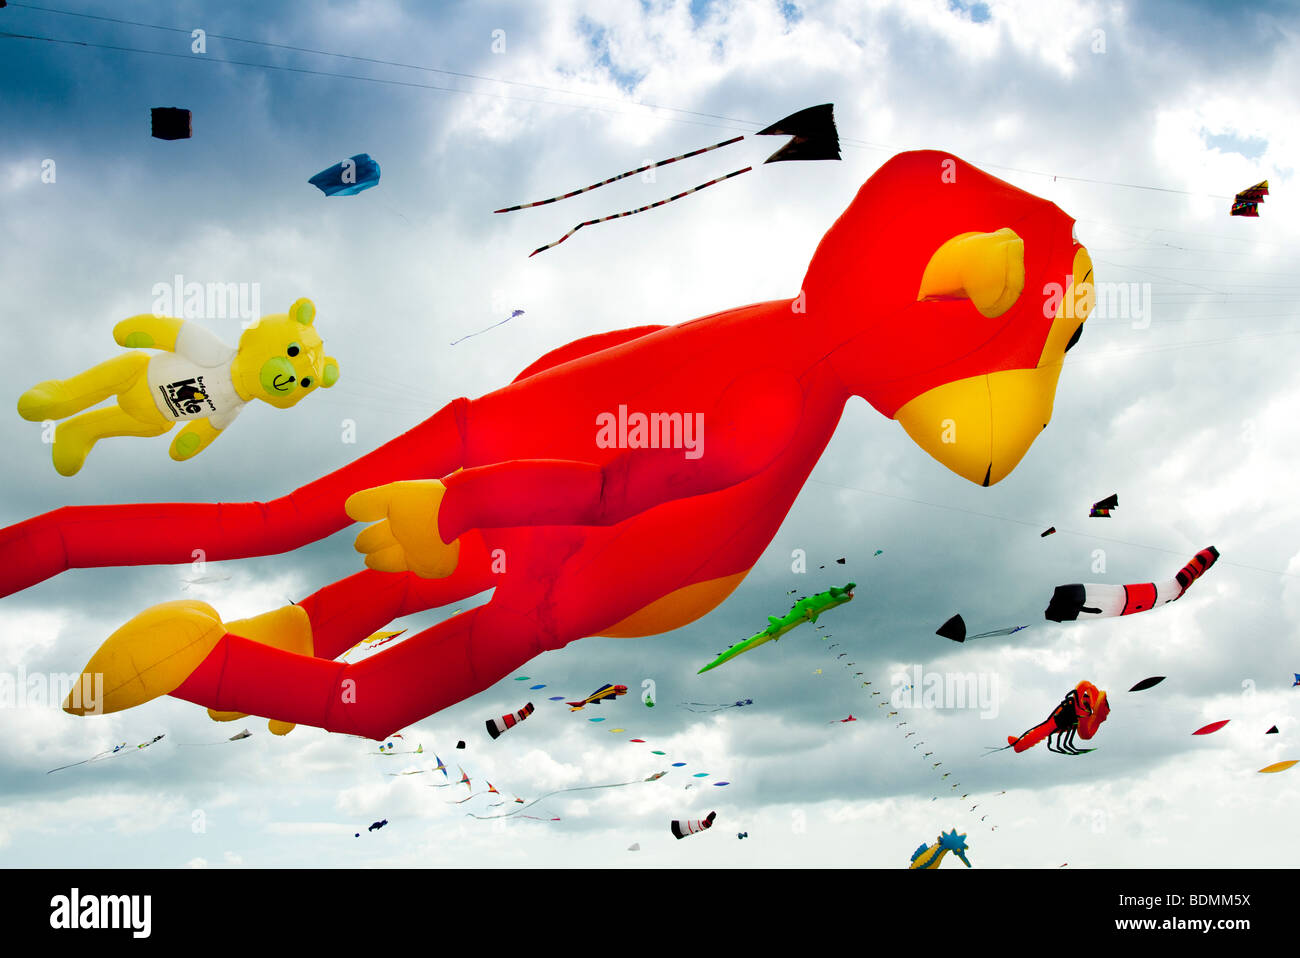 monkey kite flying at a kite festival - Stock Image